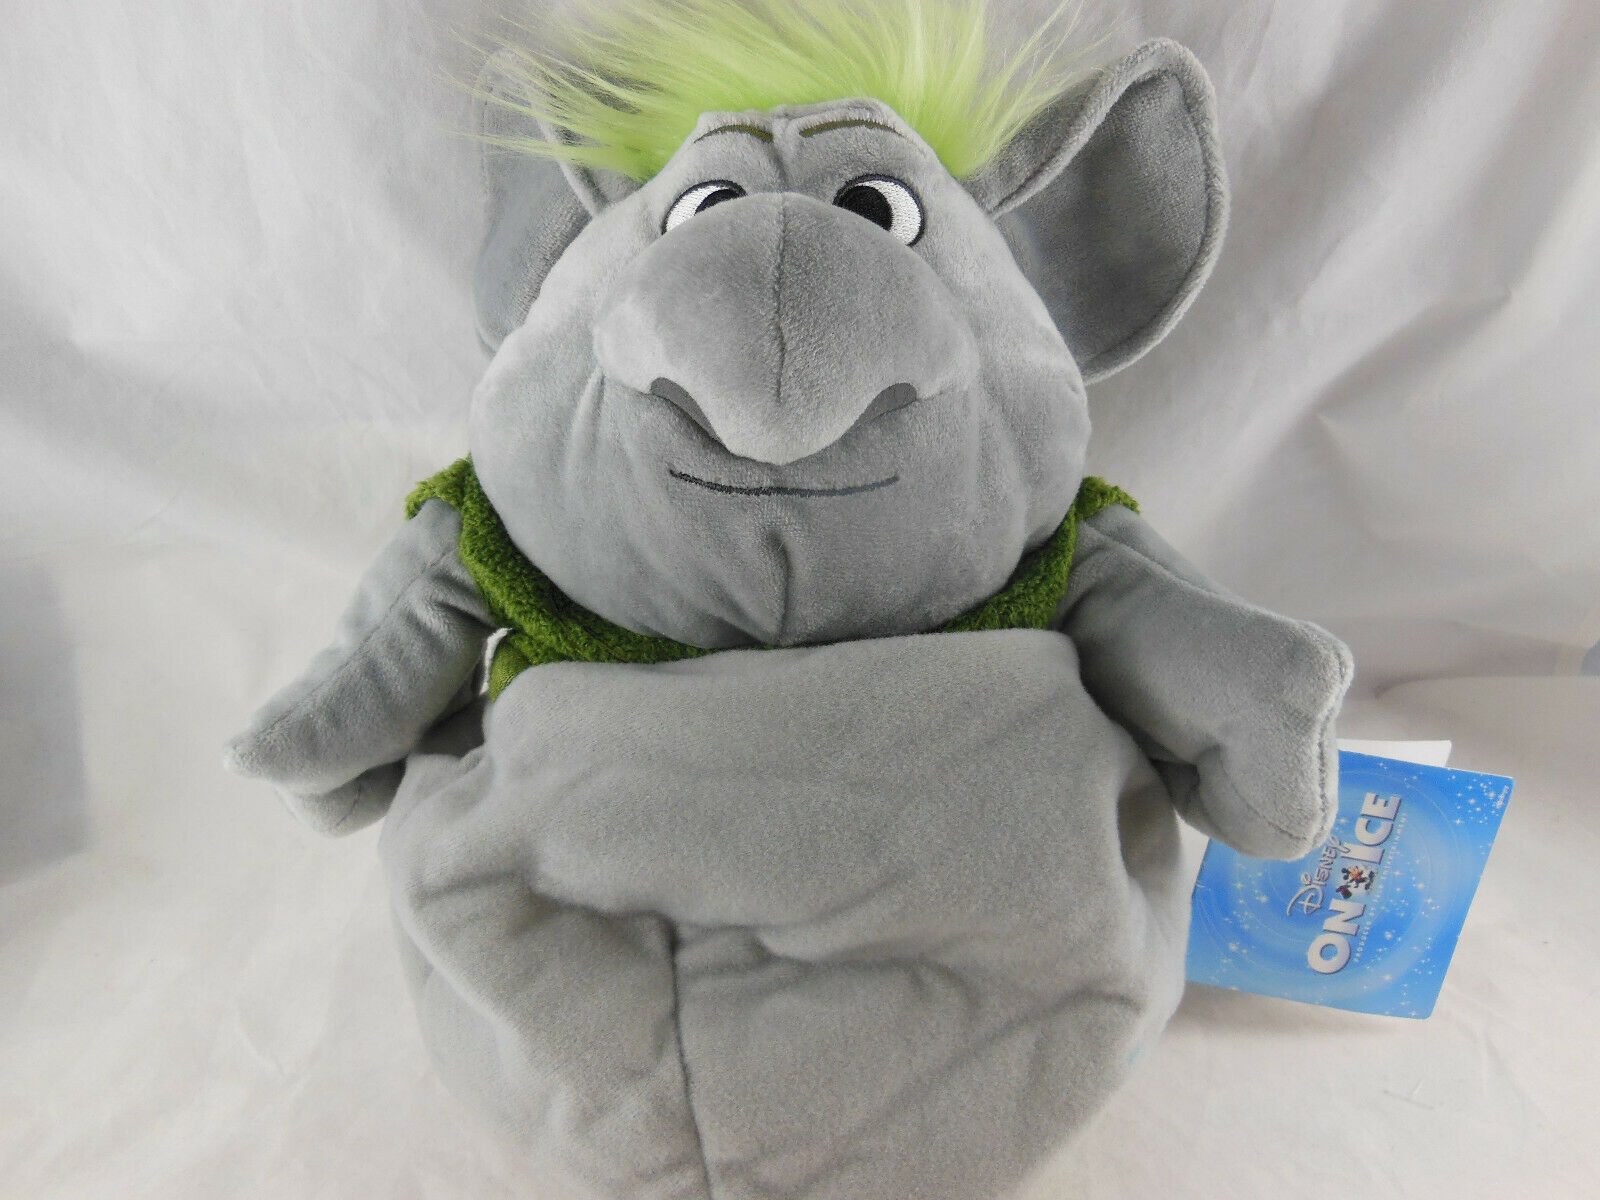 "Disney Store Frozen Rock Reversible Plush aproximately 12"" troll doll 9""' w Tag"